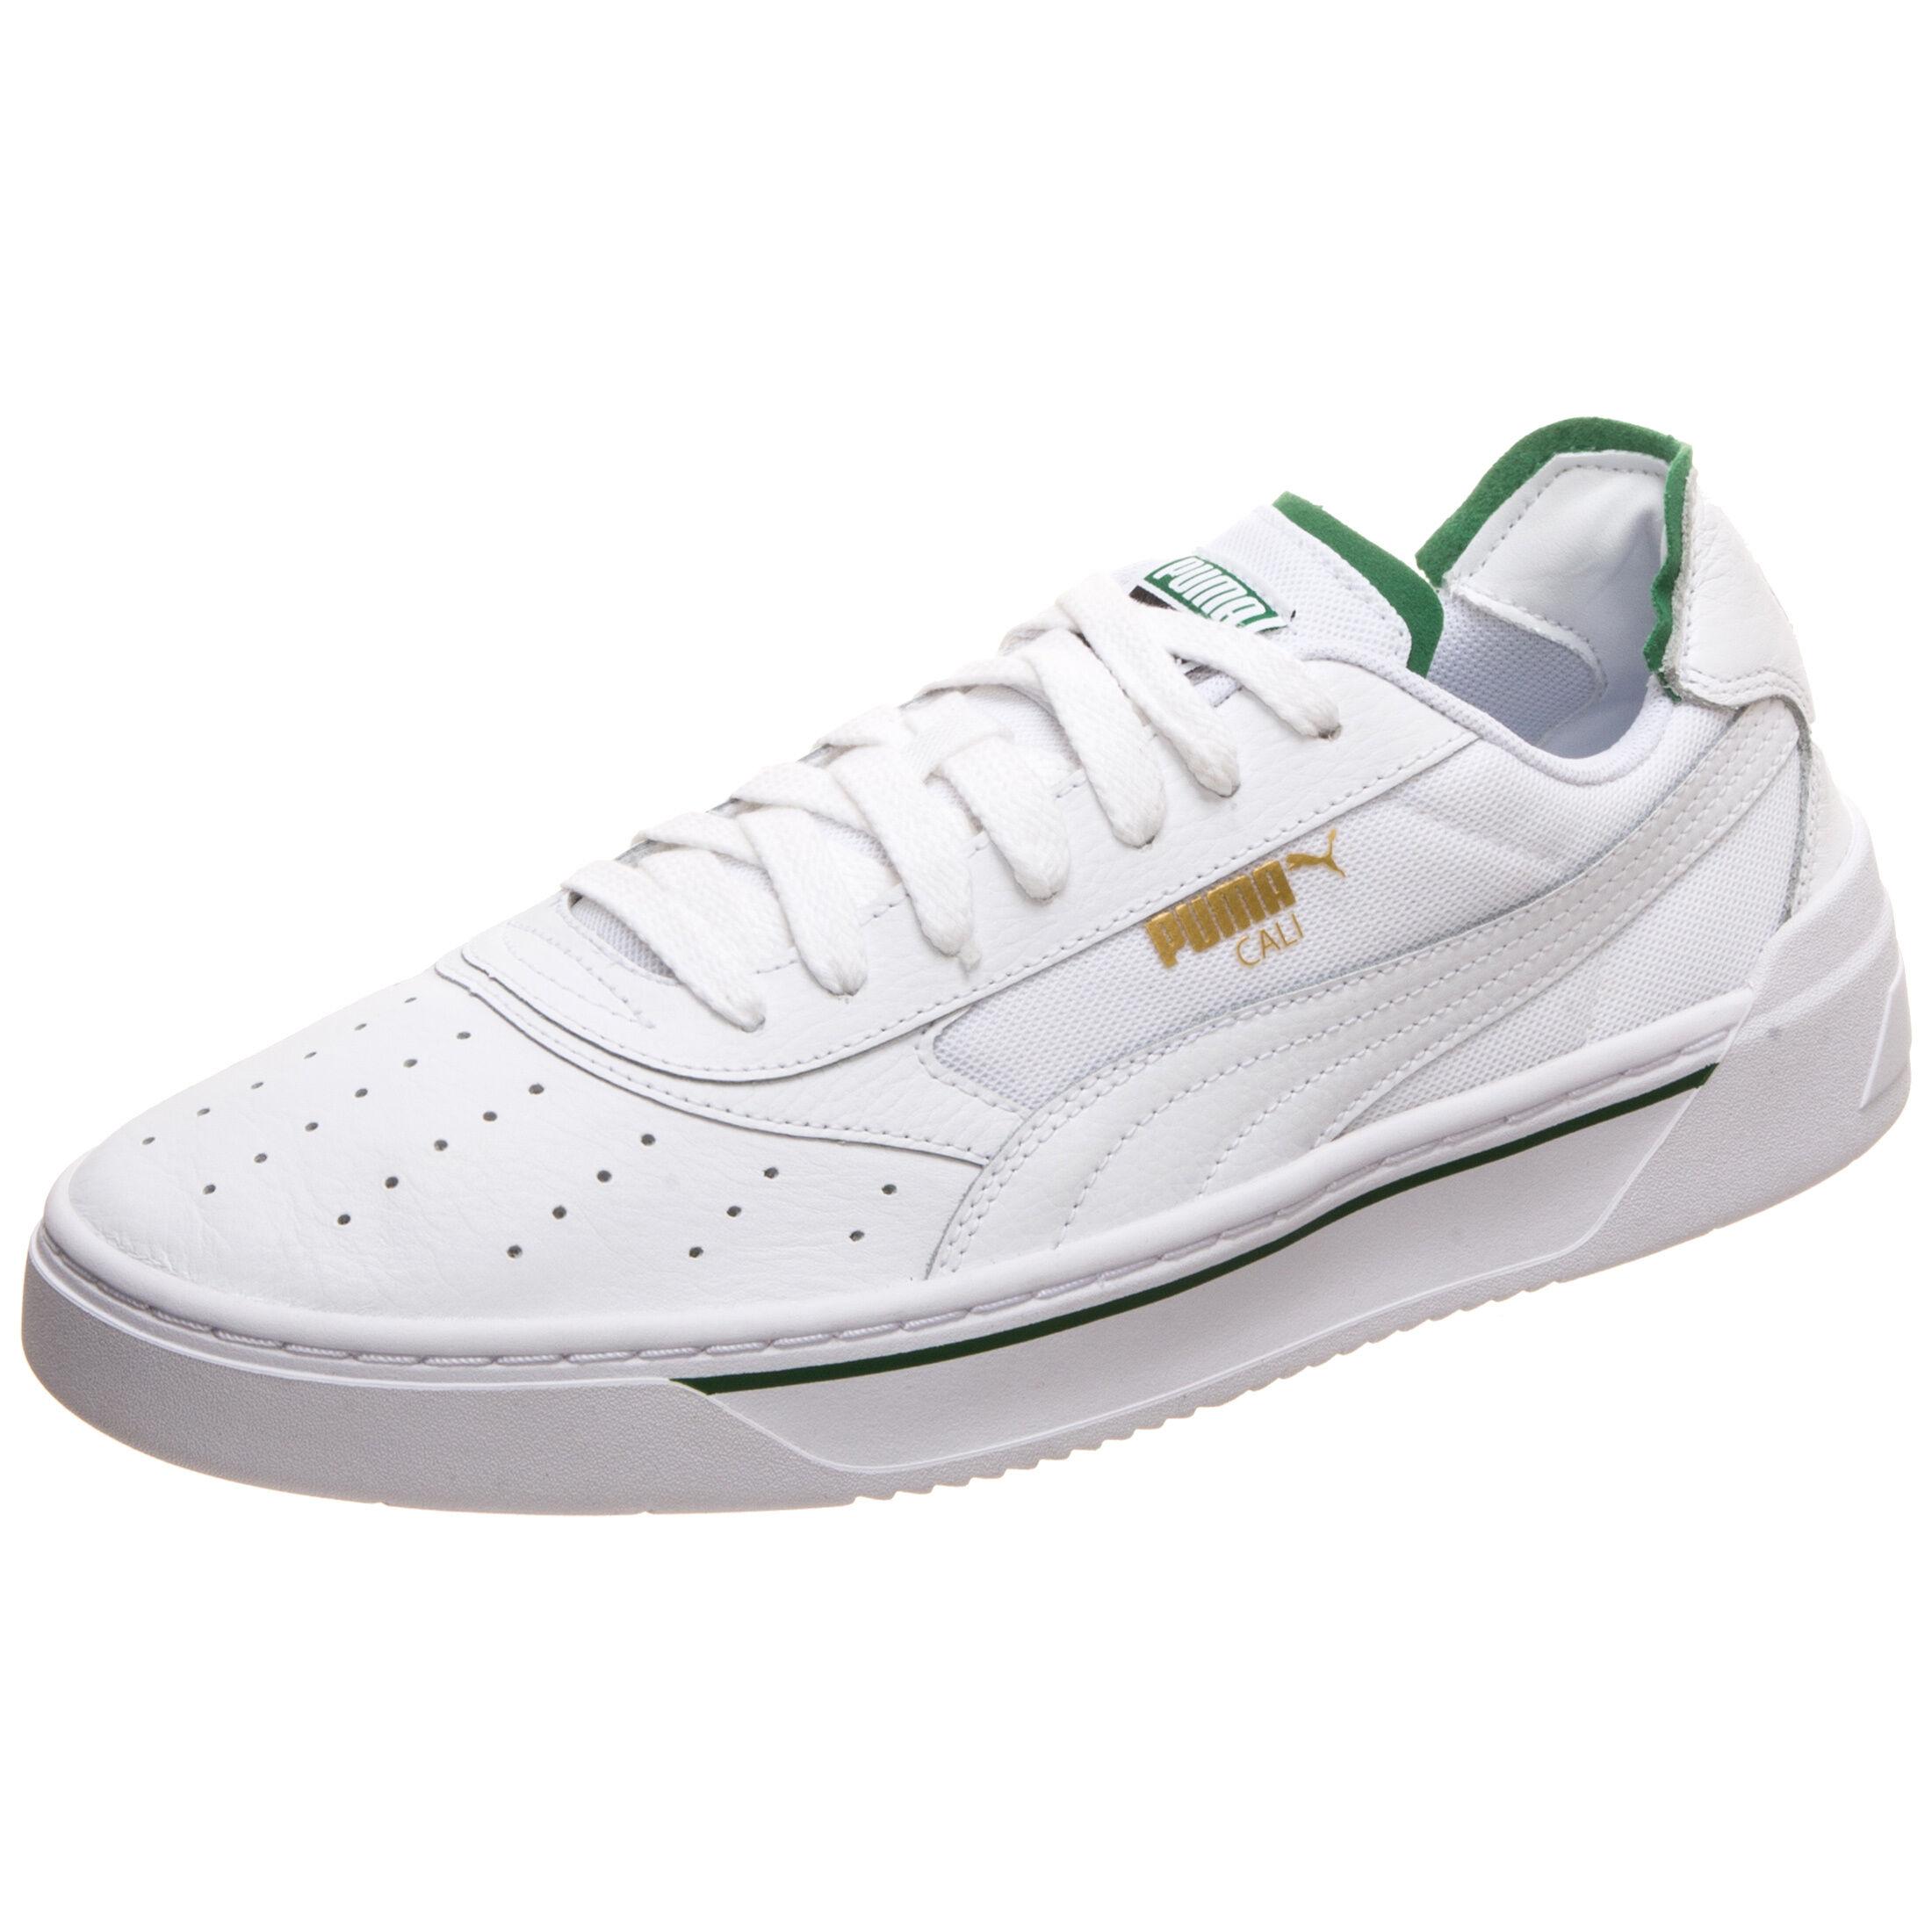 Outfitter Sneaker Bei Puma 0 Herren Cali rdxBeWCo